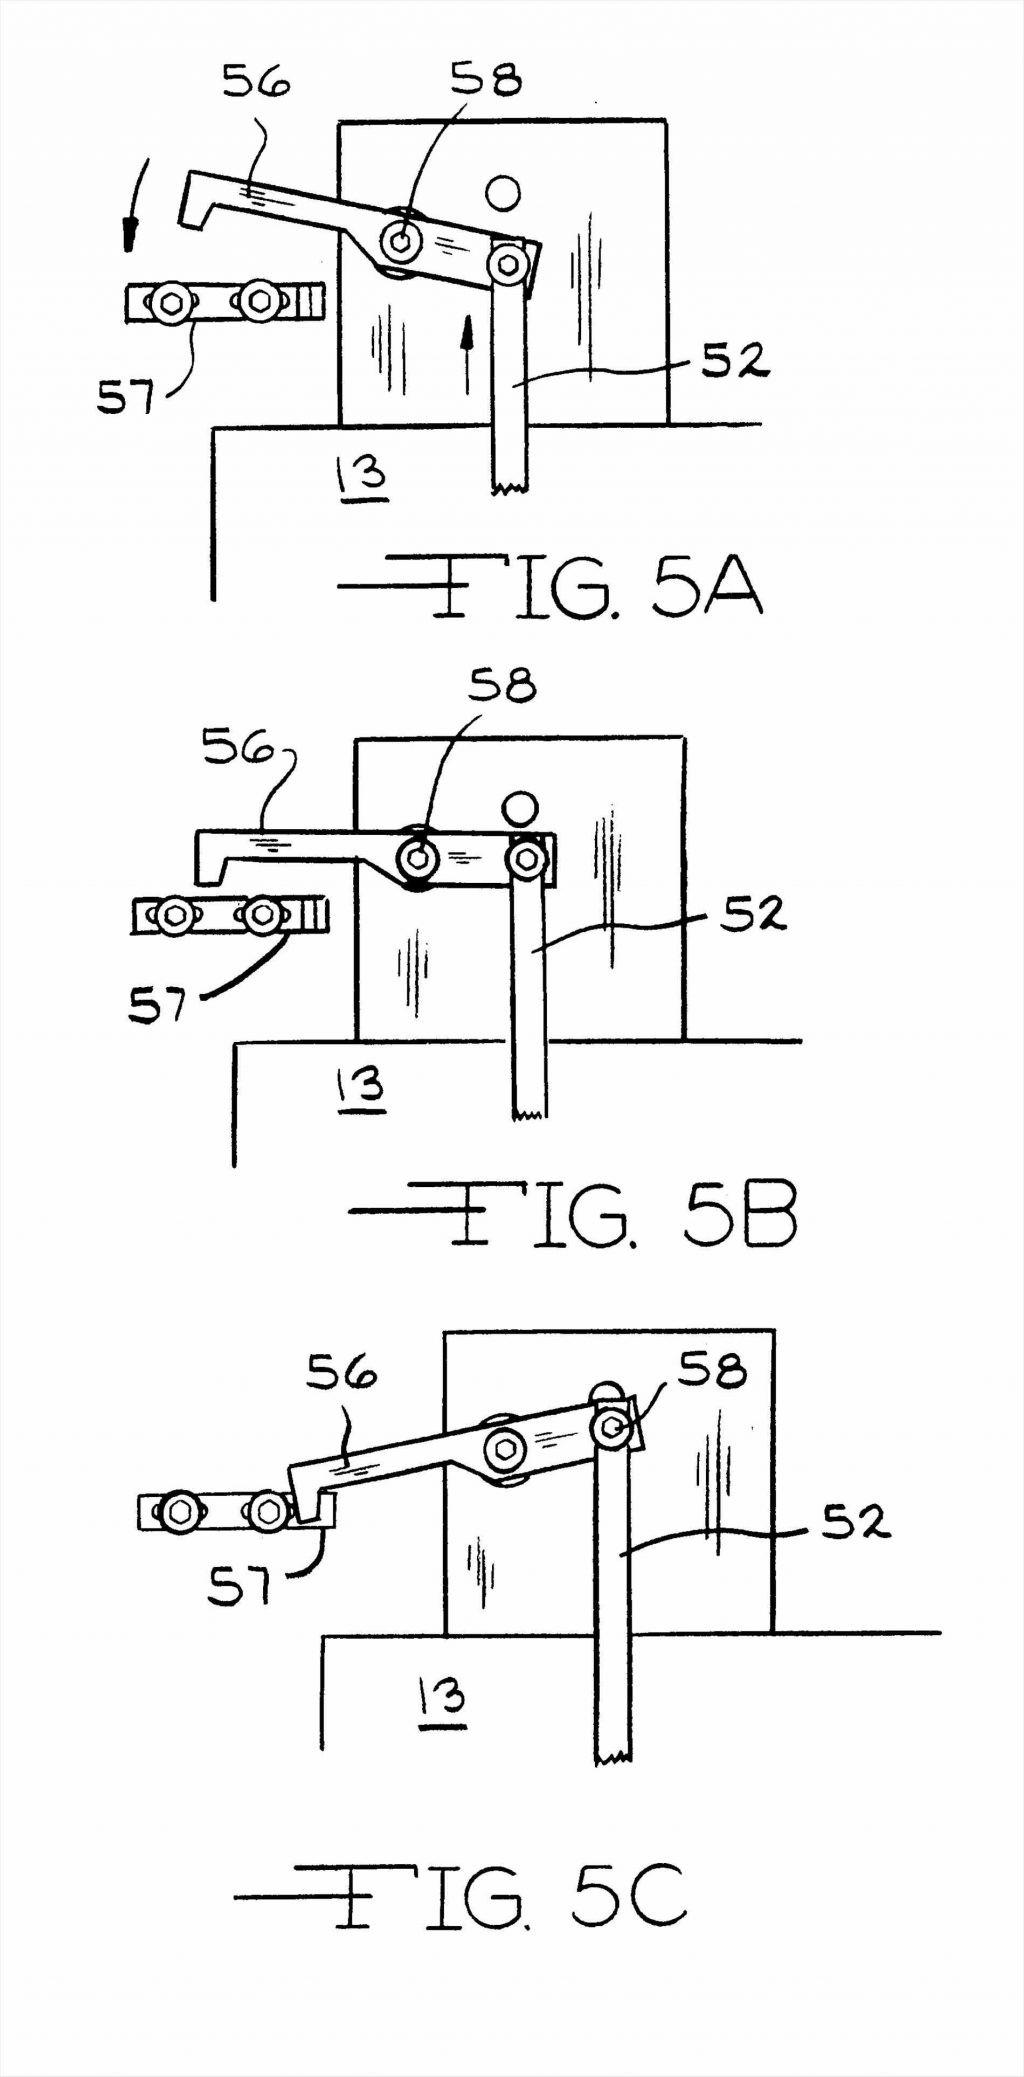 door diagram one piece hydraulic door forces diagram. Black Bedroom Furniture Sets. Home Design Ideas